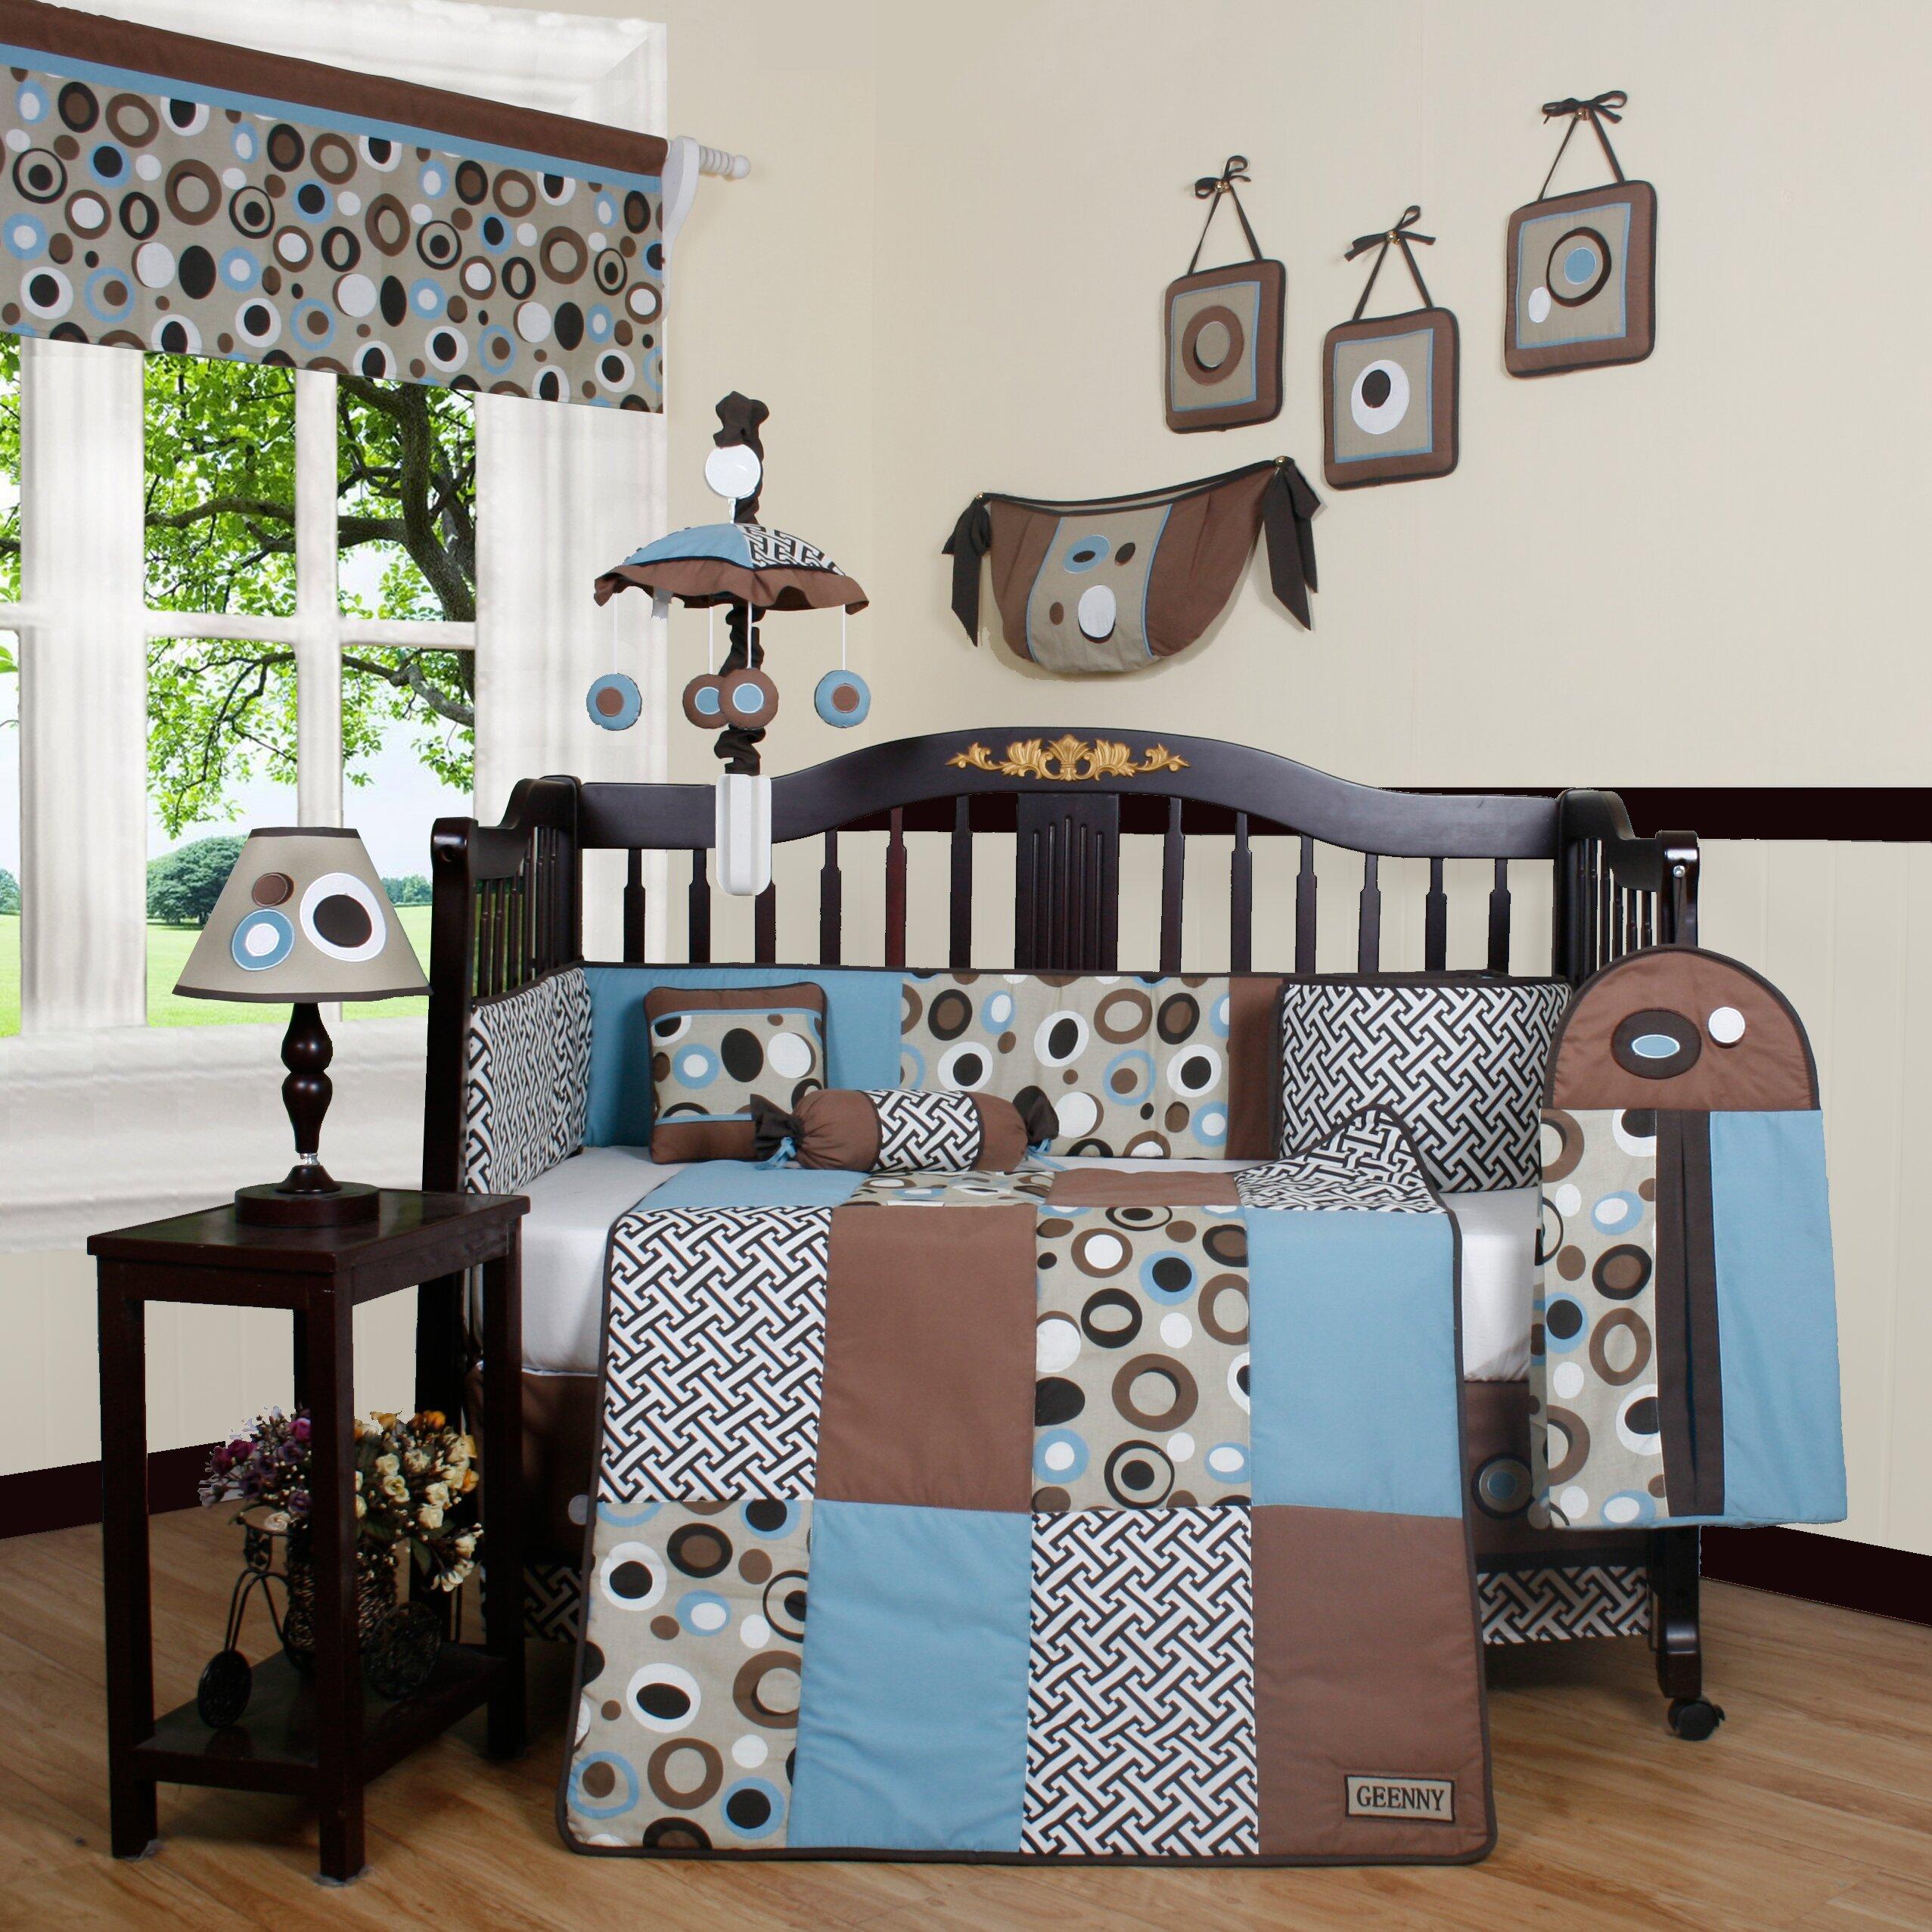 Geenny Boutique Scribble 13 Piece Crib Bedding Set ...